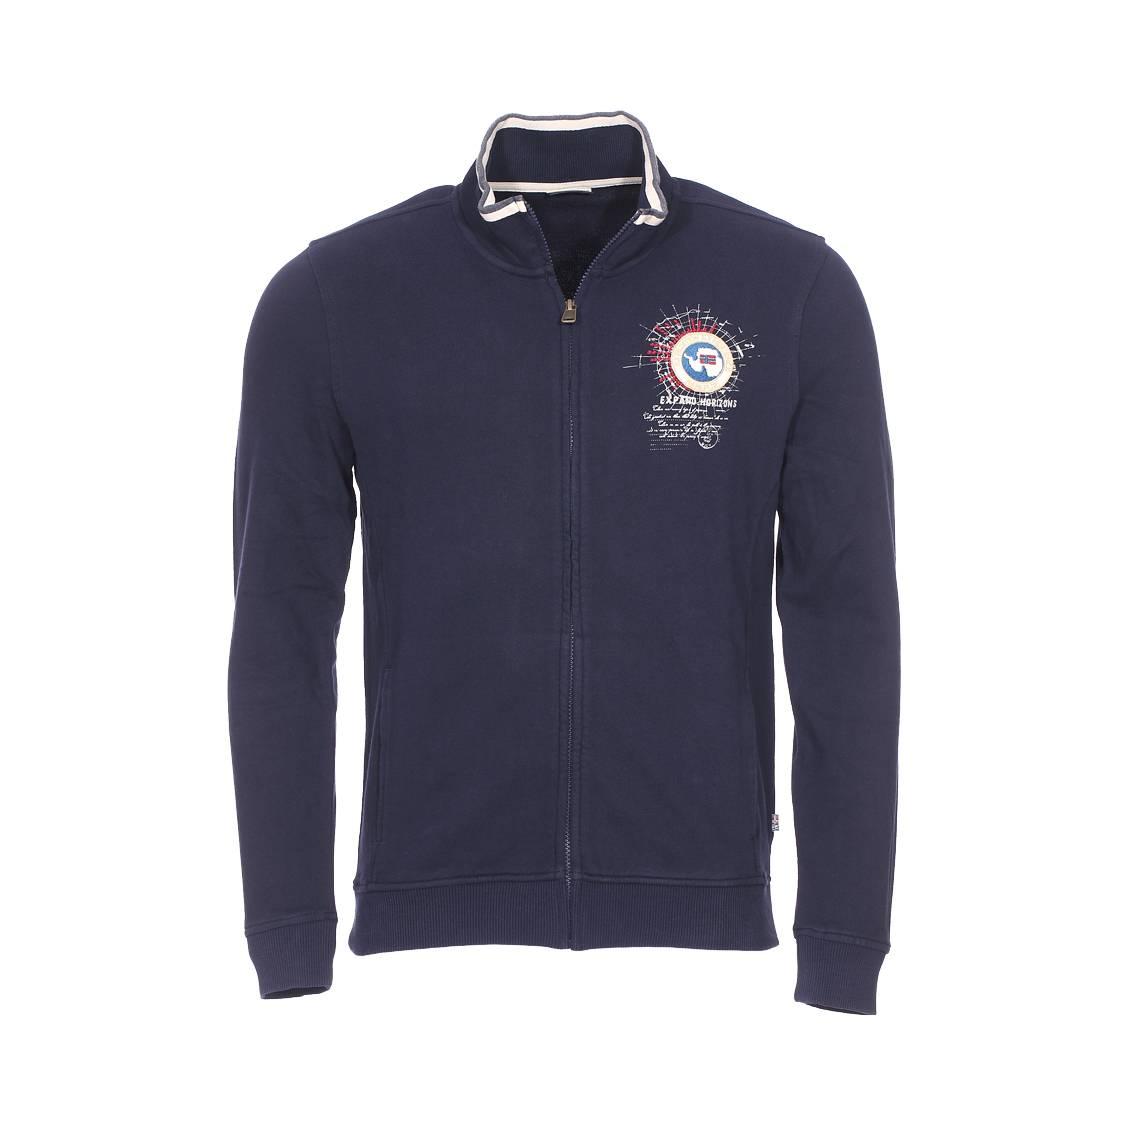 Sweat zippé Napapijri Bochil en coton bleu marine | Rue Des Hommes